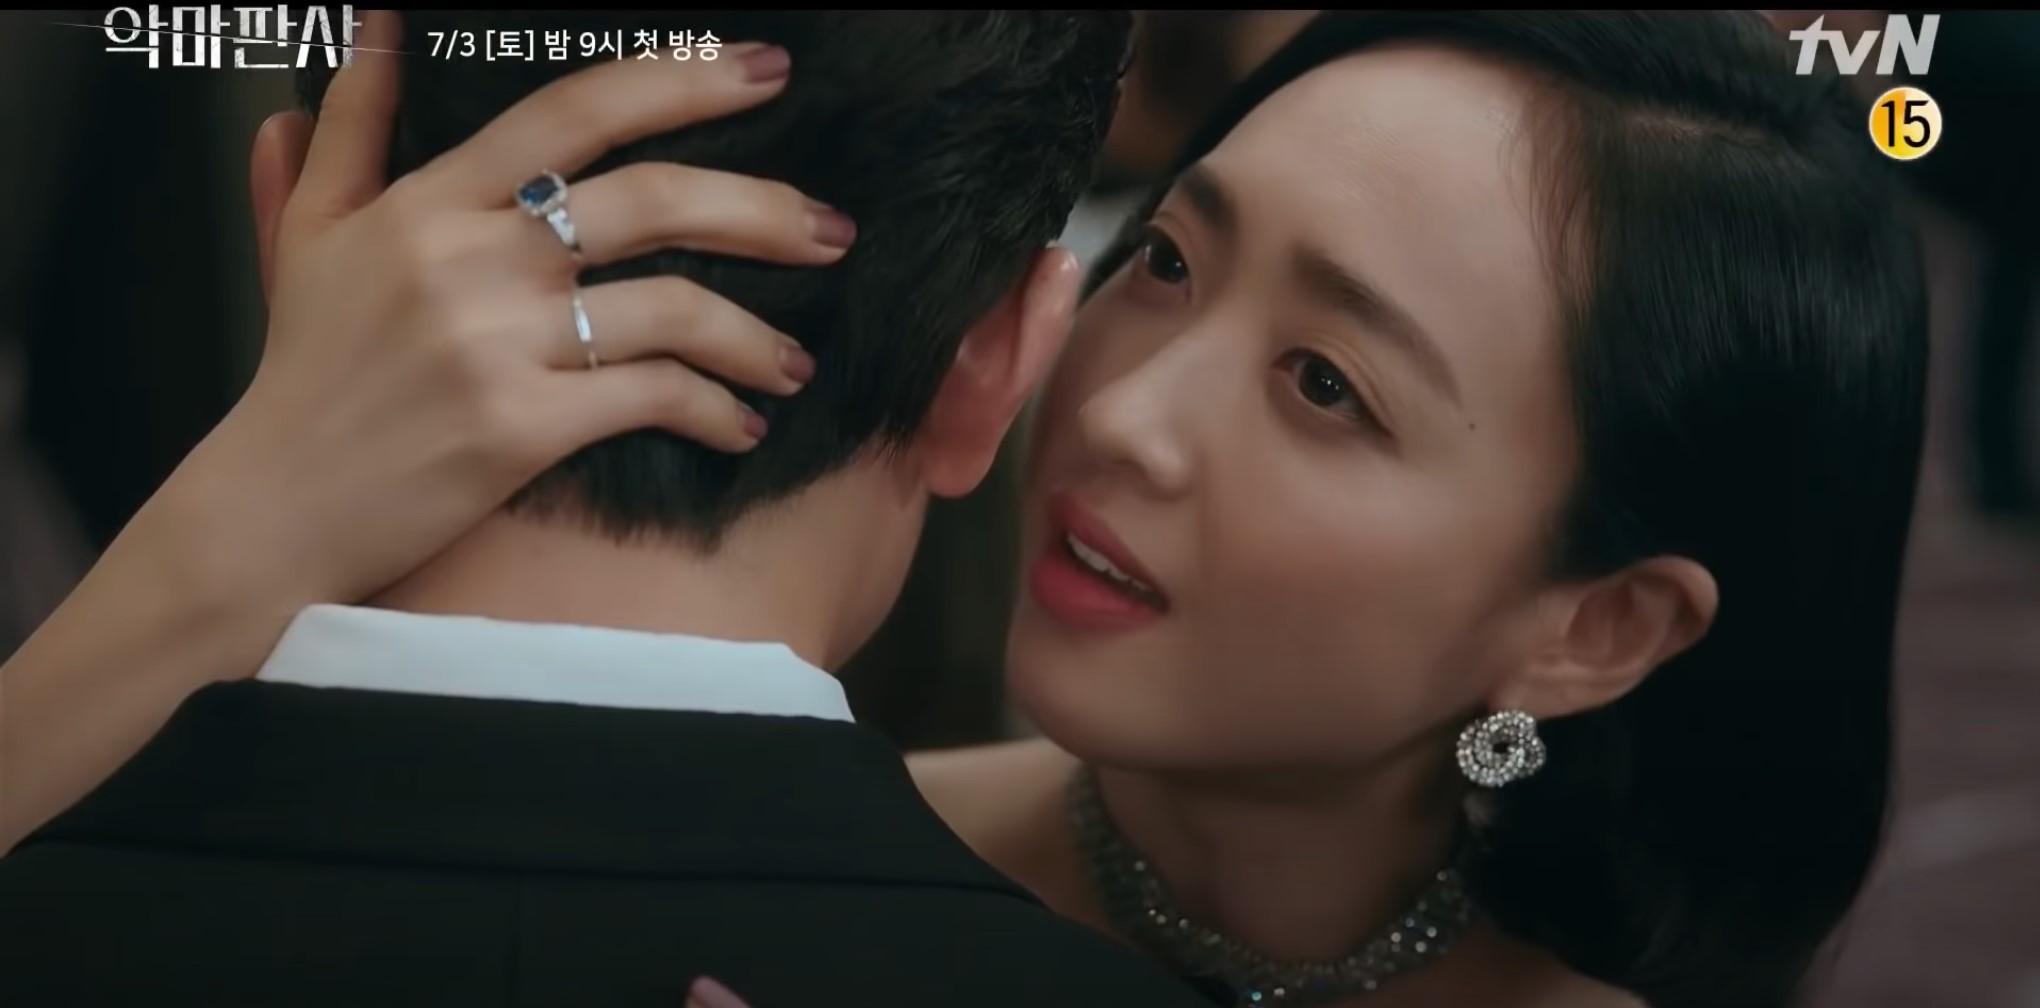 Kim Min-jung antagonizes Ji Sung in new promos for Devil Judge